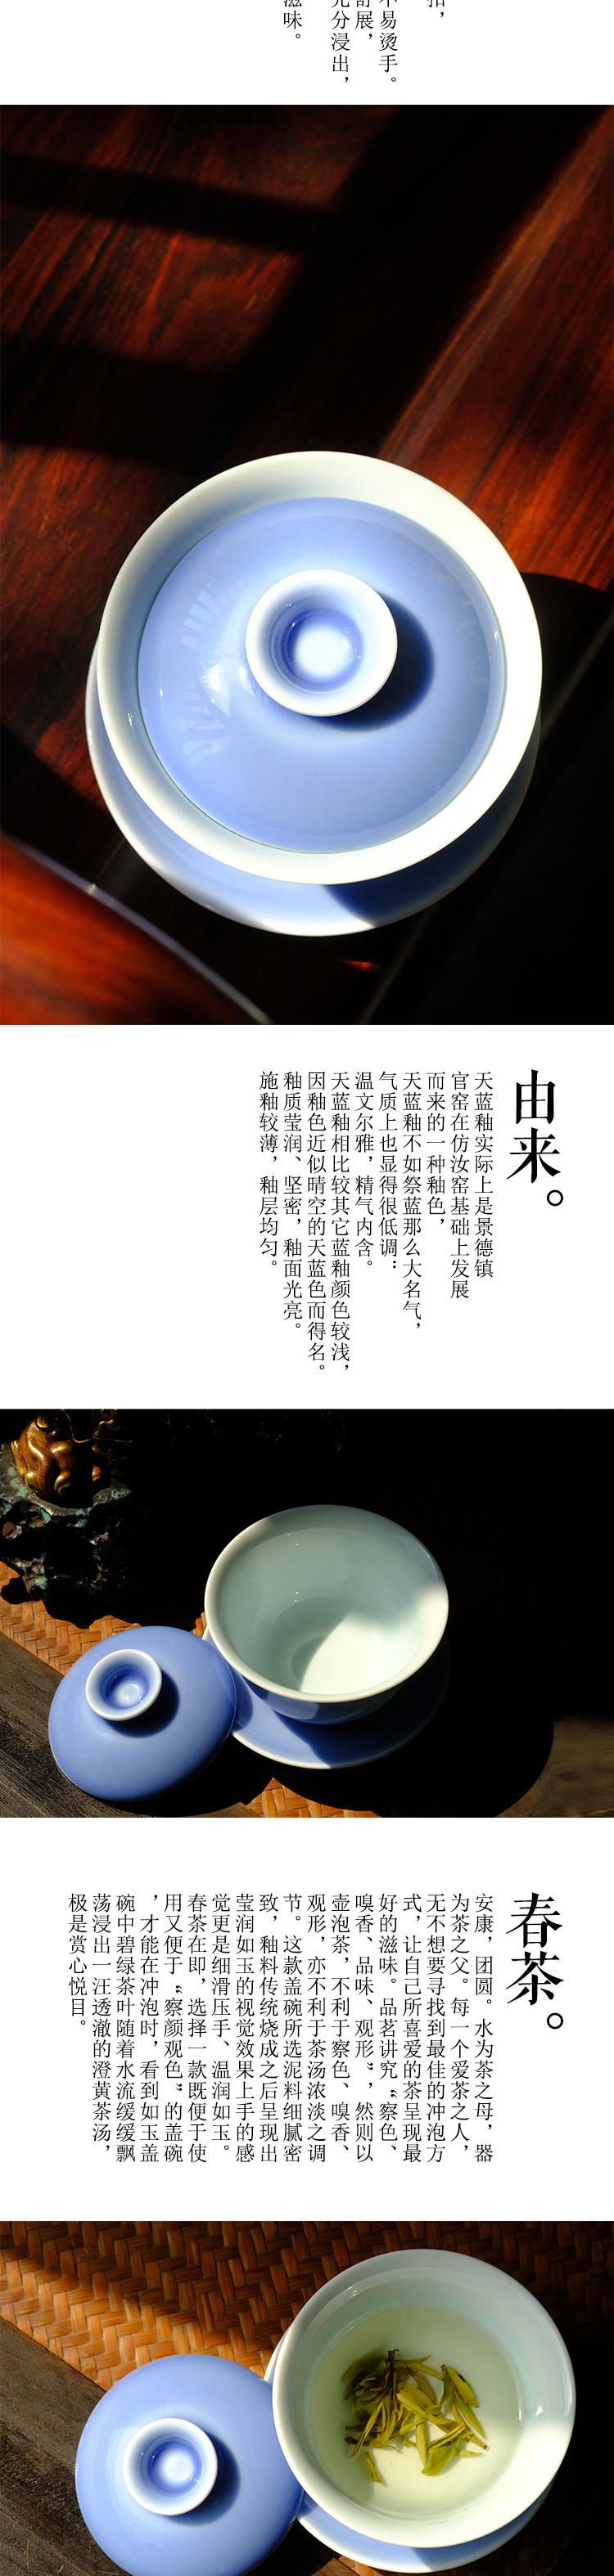 Offered home - cooked ju long up controller shamrock glaze tureen jingdezhen pure manual archaize ceramic tea tea bowl